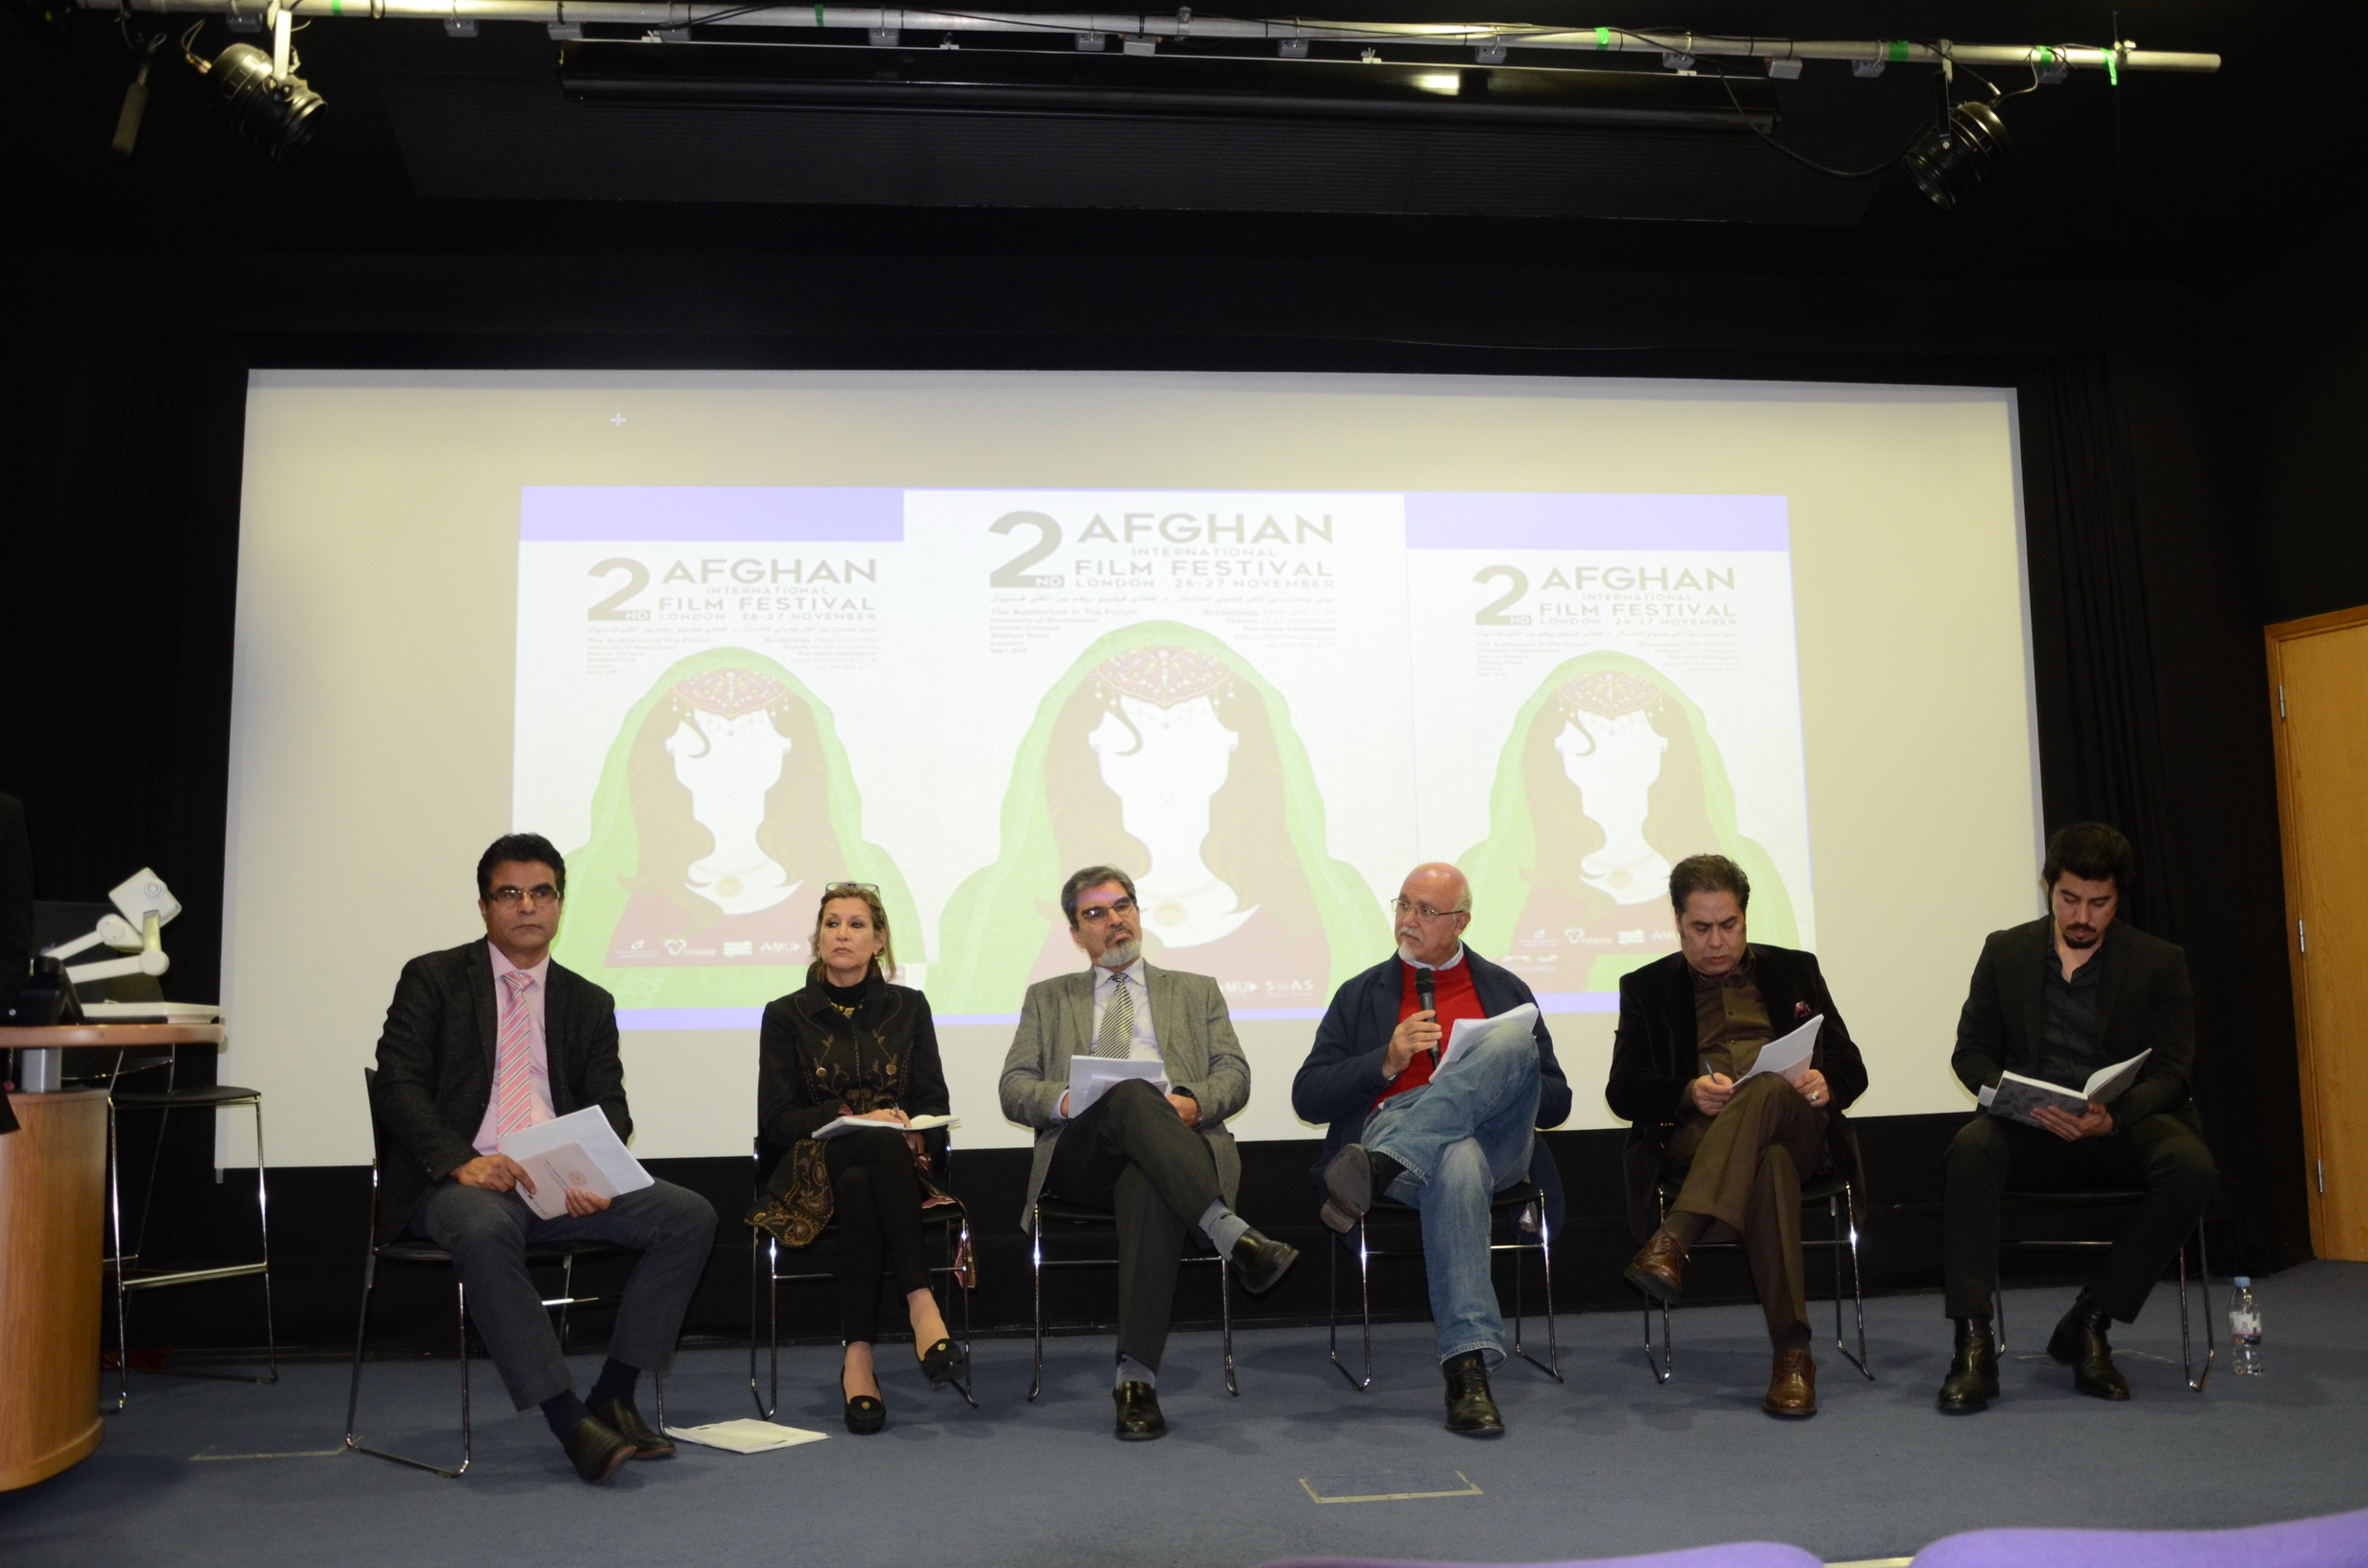 Judges:  2nd Afghan international film festival in London